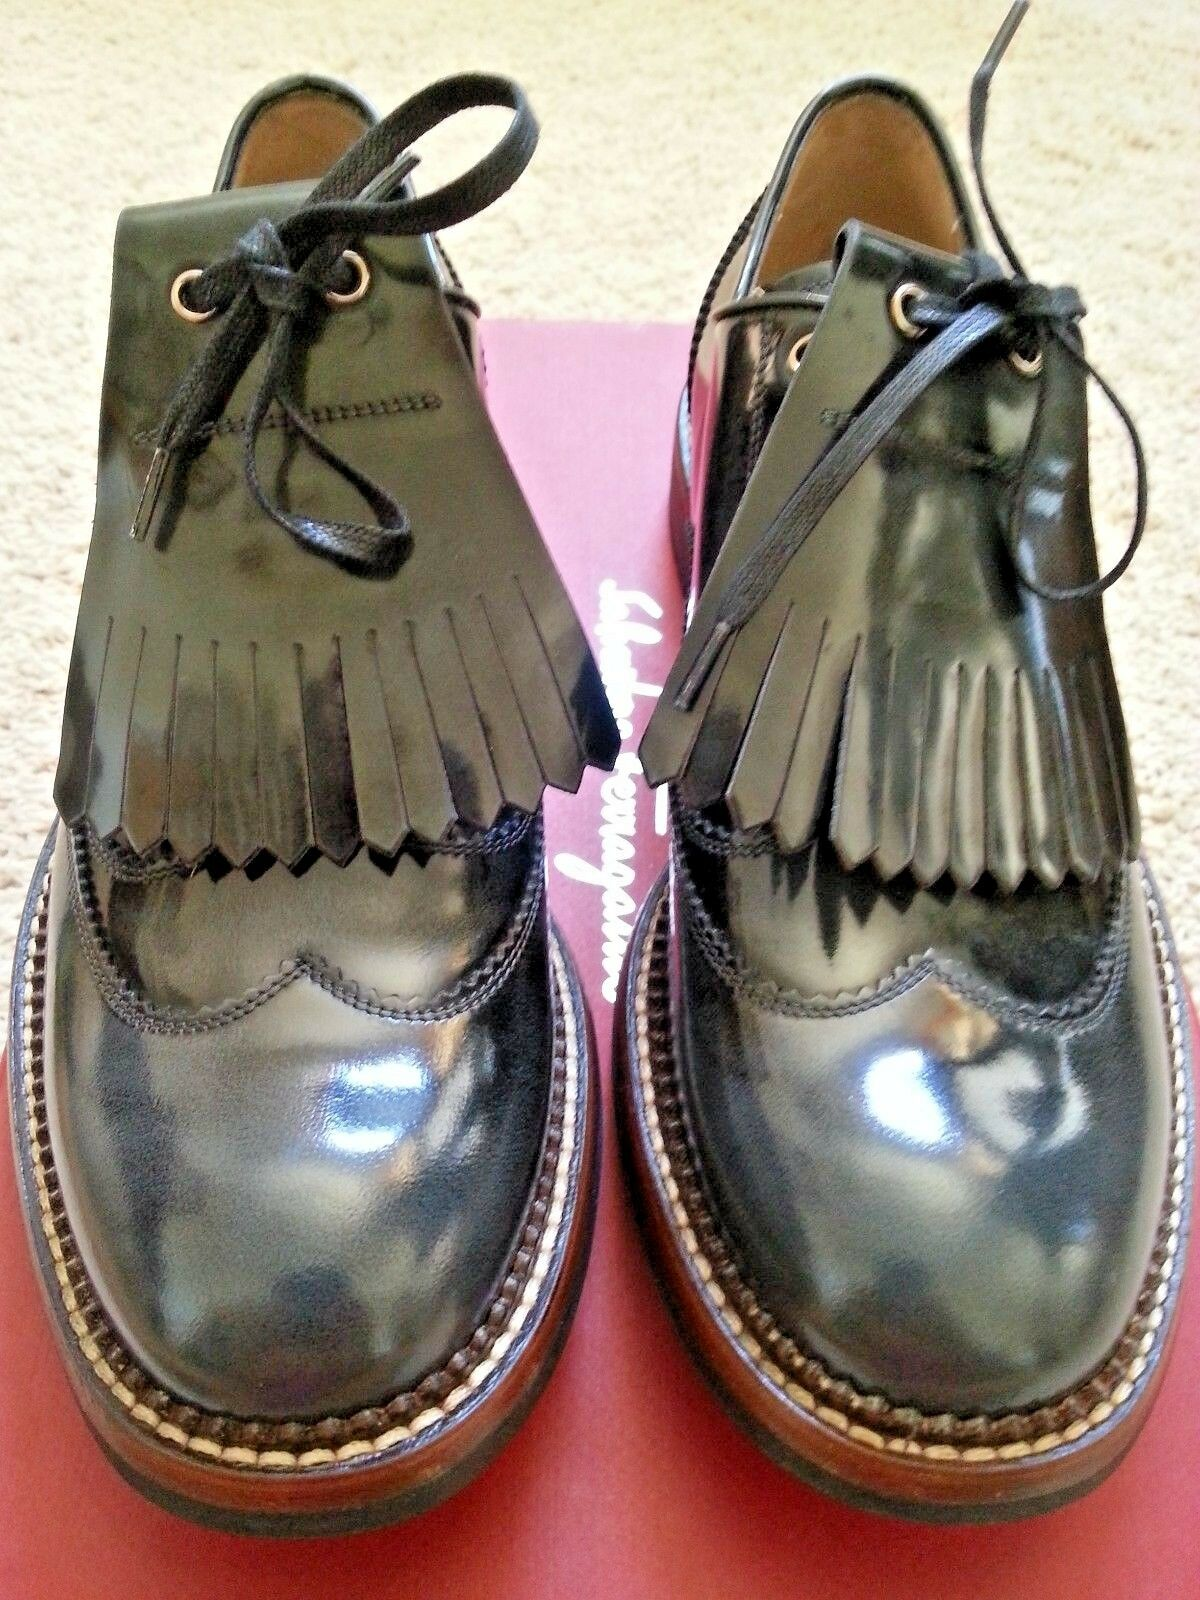 NEW  895 Salvatore Ferragamo Rueda Leather Lace-Up Smoked Black Oxfords 7 M